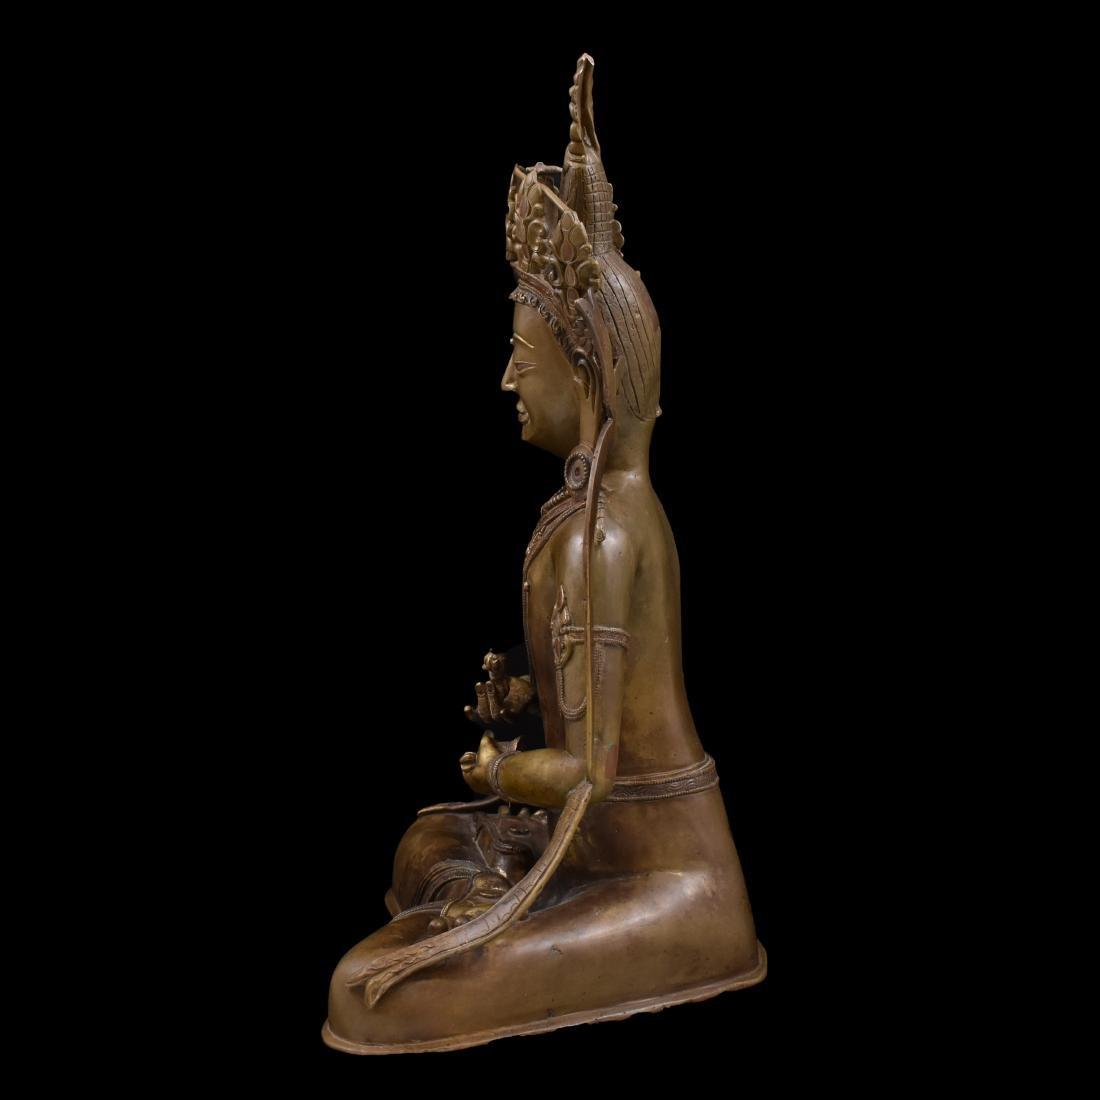 LARGE QING BRONZE BUDDHA FIGURE OF VAJRADHARA - 8